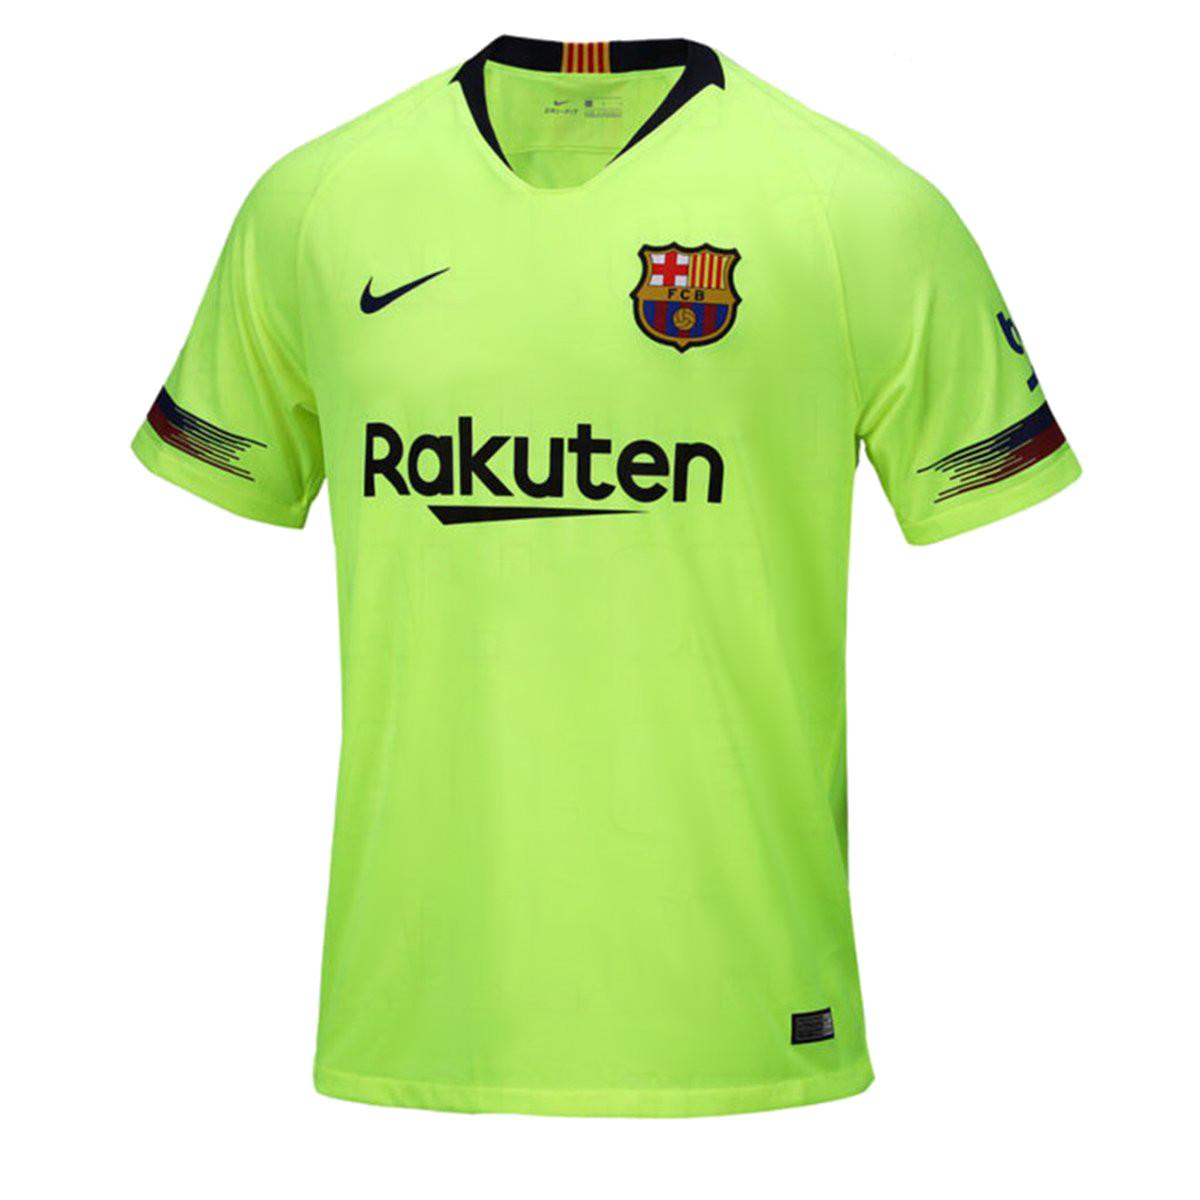 FC Barcelone 2018 2019 maillot de foot exterieur jaune Nike 18 19